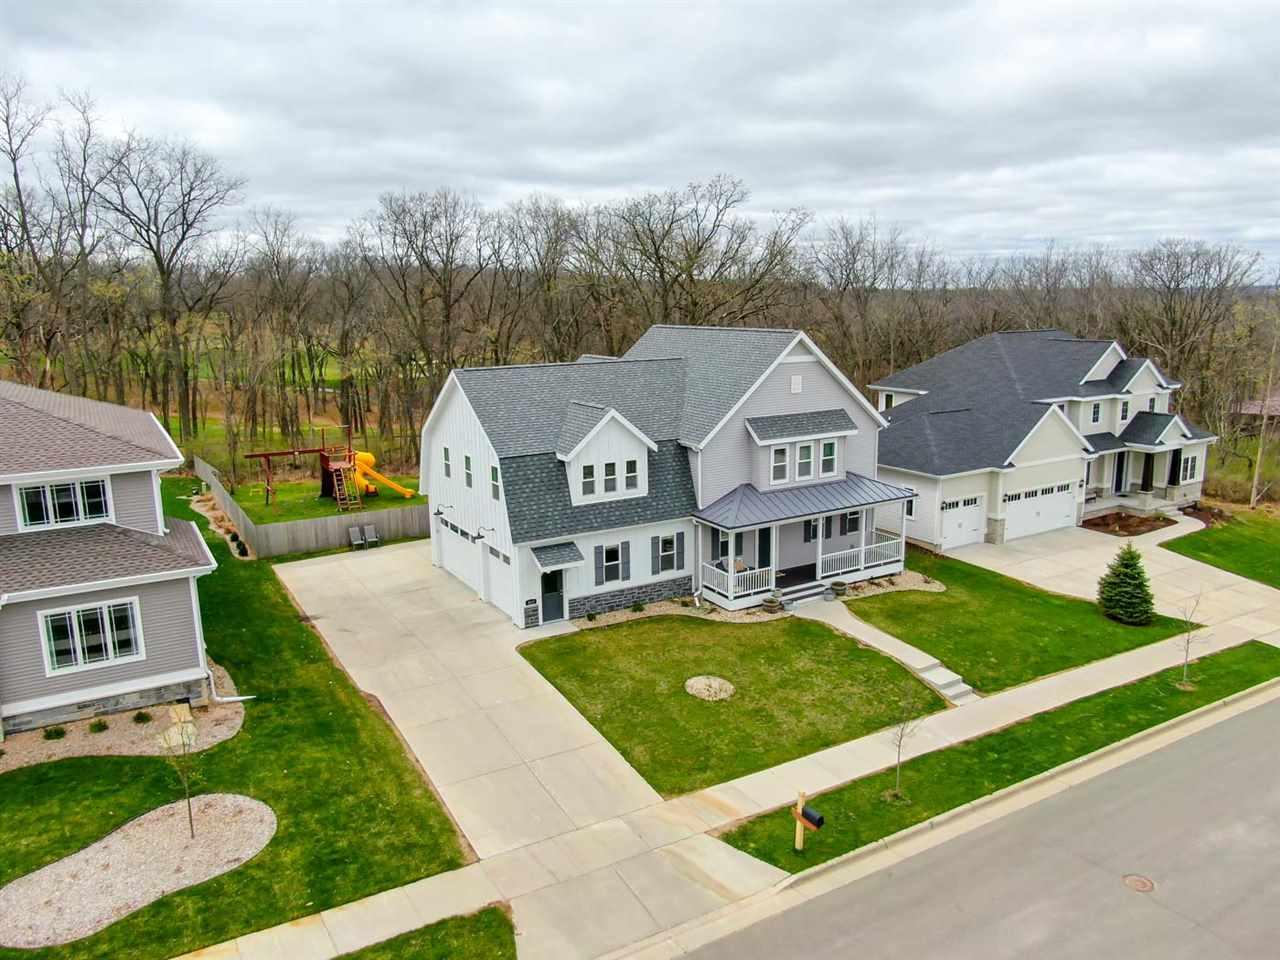 9417 Ashworth Dr, Verona, Wisconsin 53593, 4 Bedrooms Bedrooms, ,3 BathroomsBathrooms,Single Family,For Sale,9417 Ashworth Dr,2,1907045